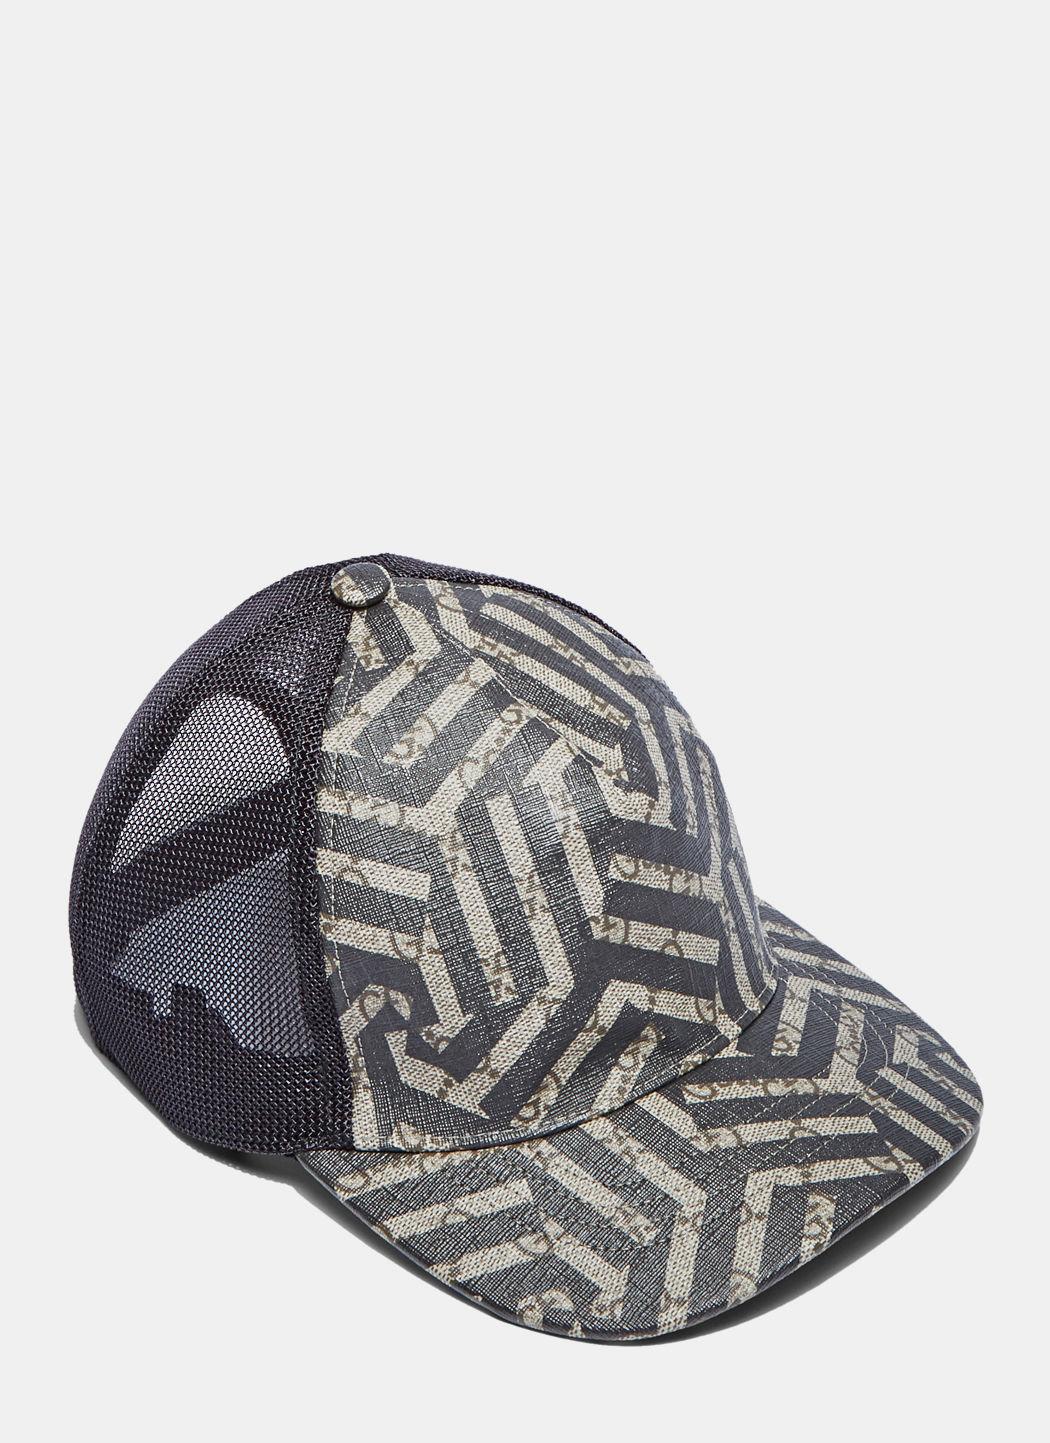 fa2e04974dd1 Gucci Men S Geometric Print 6 Panel Baseball Cap In Beige And Black In  Beige Nero